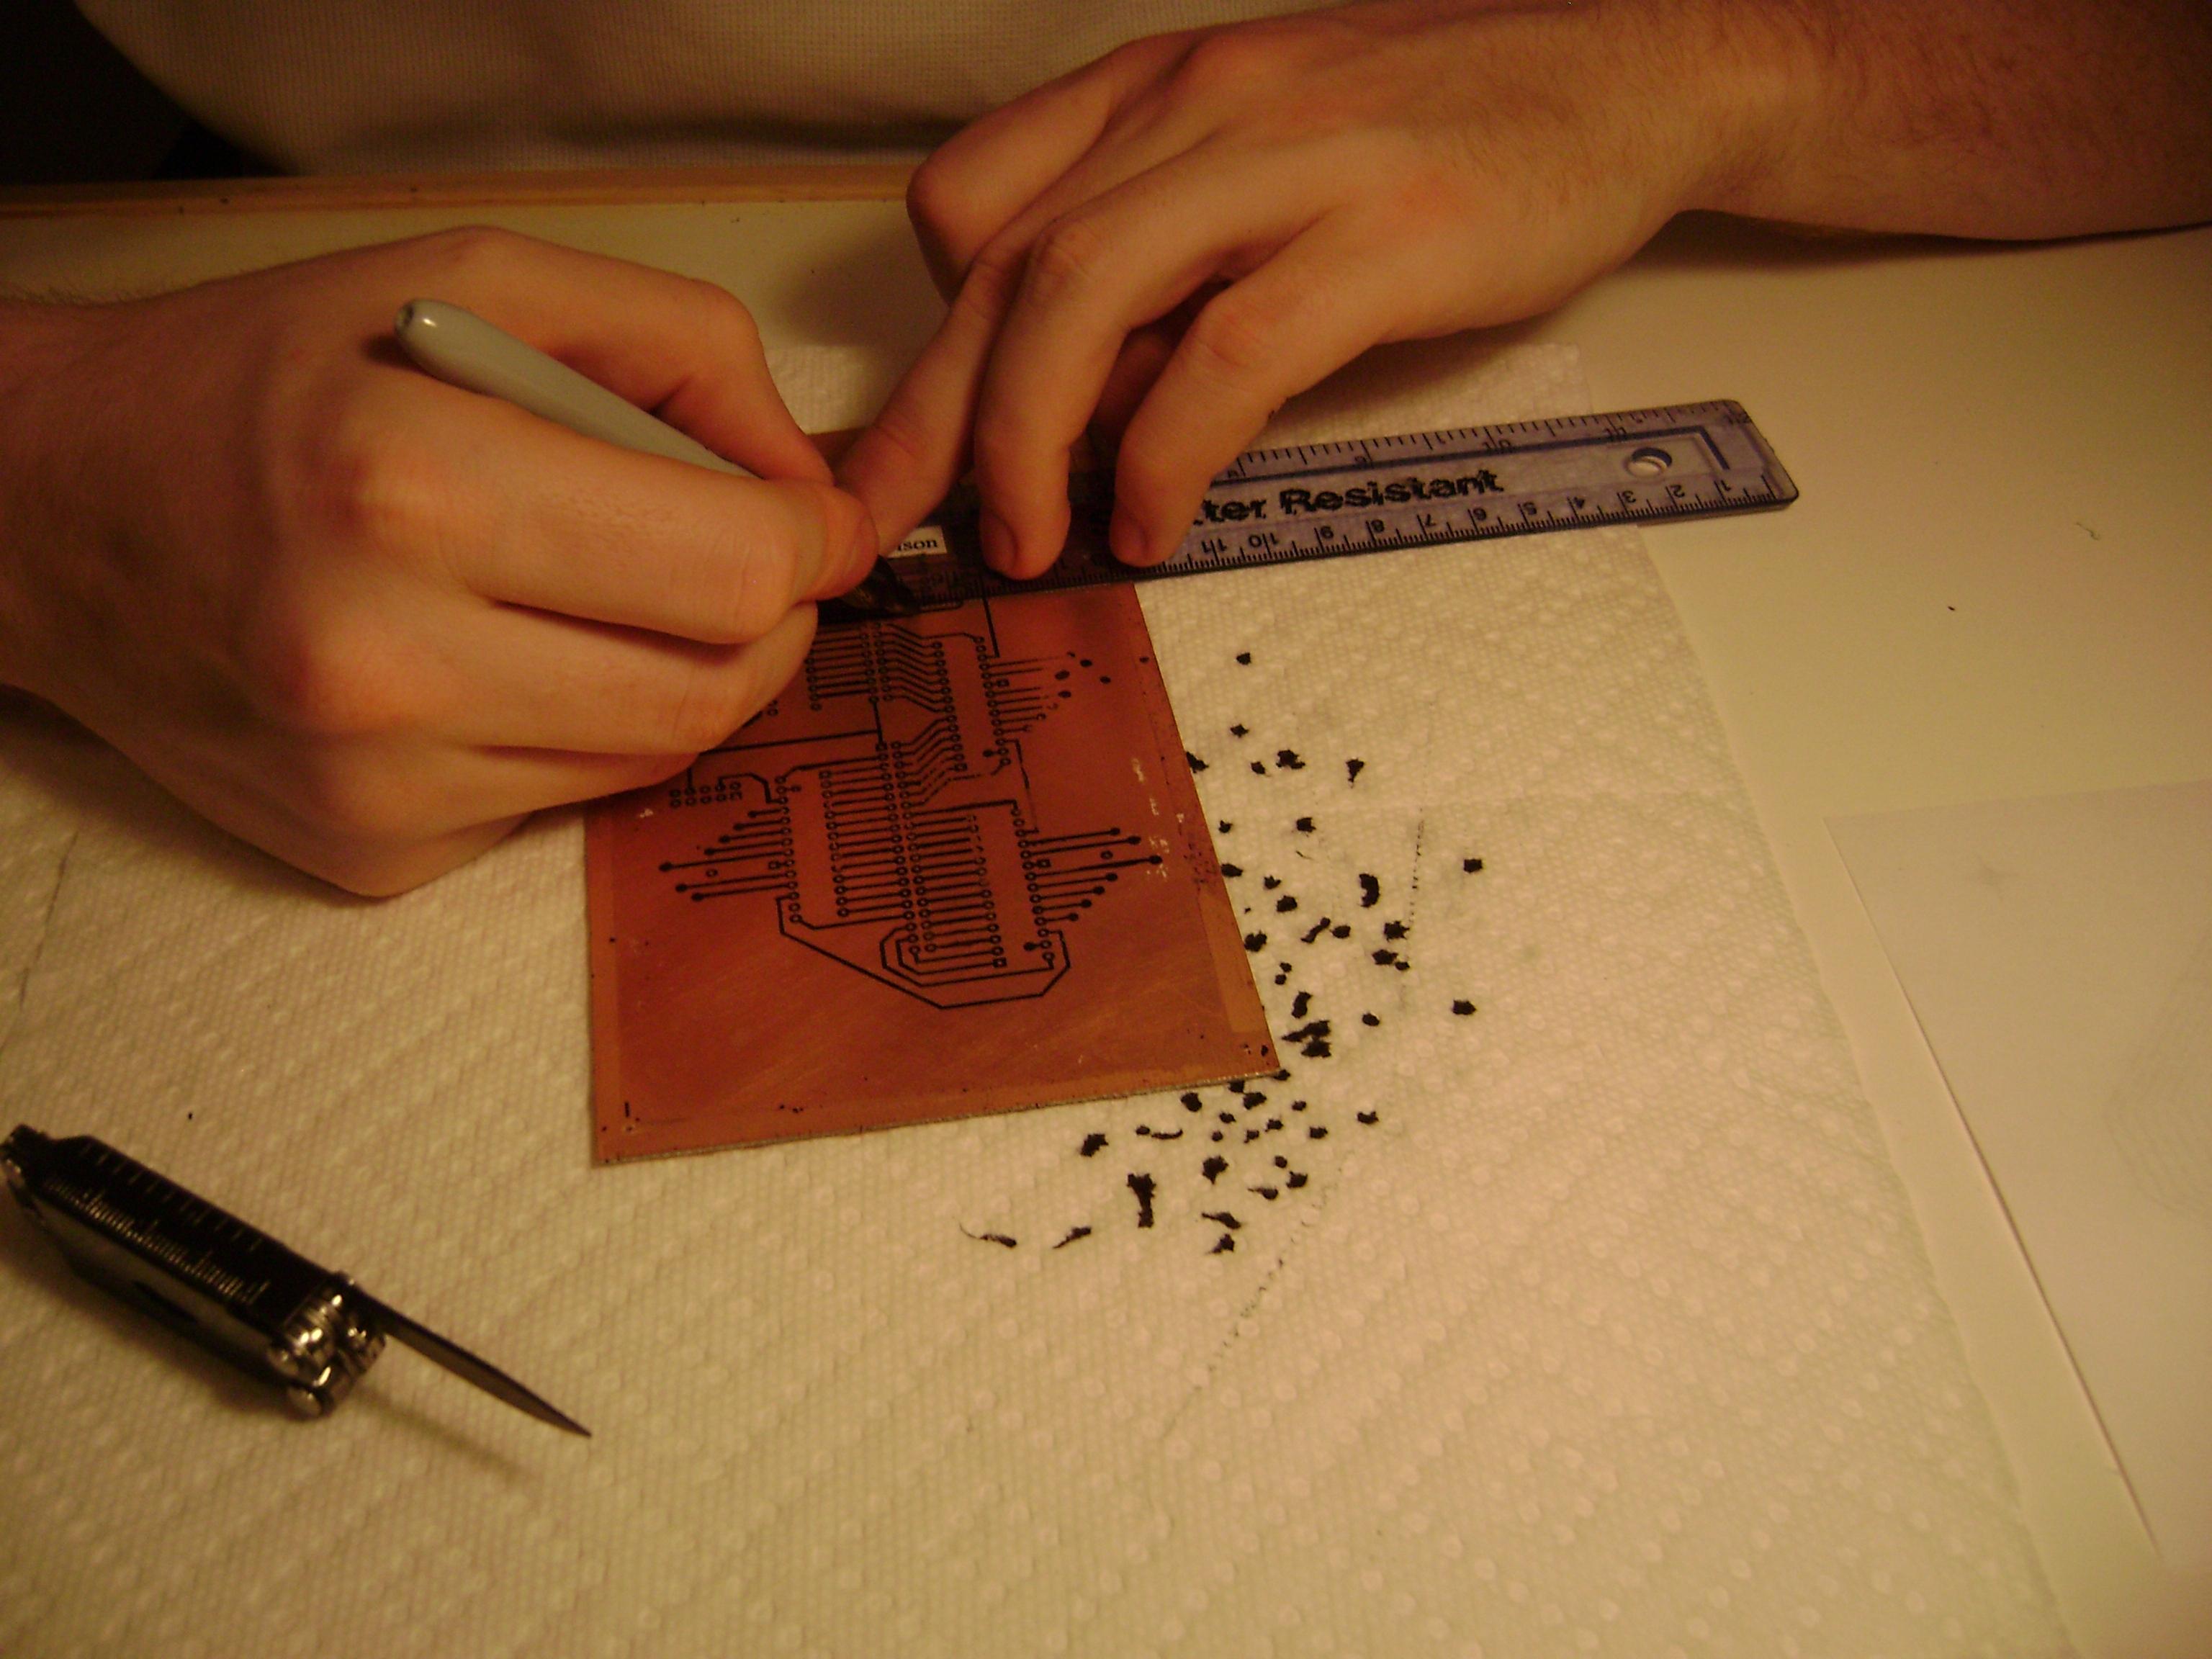 Copper Circuit Board Etching Wiring Diagram Master Blogs Boards A Heath Paddock Rh Heathpaddock Com Pcb